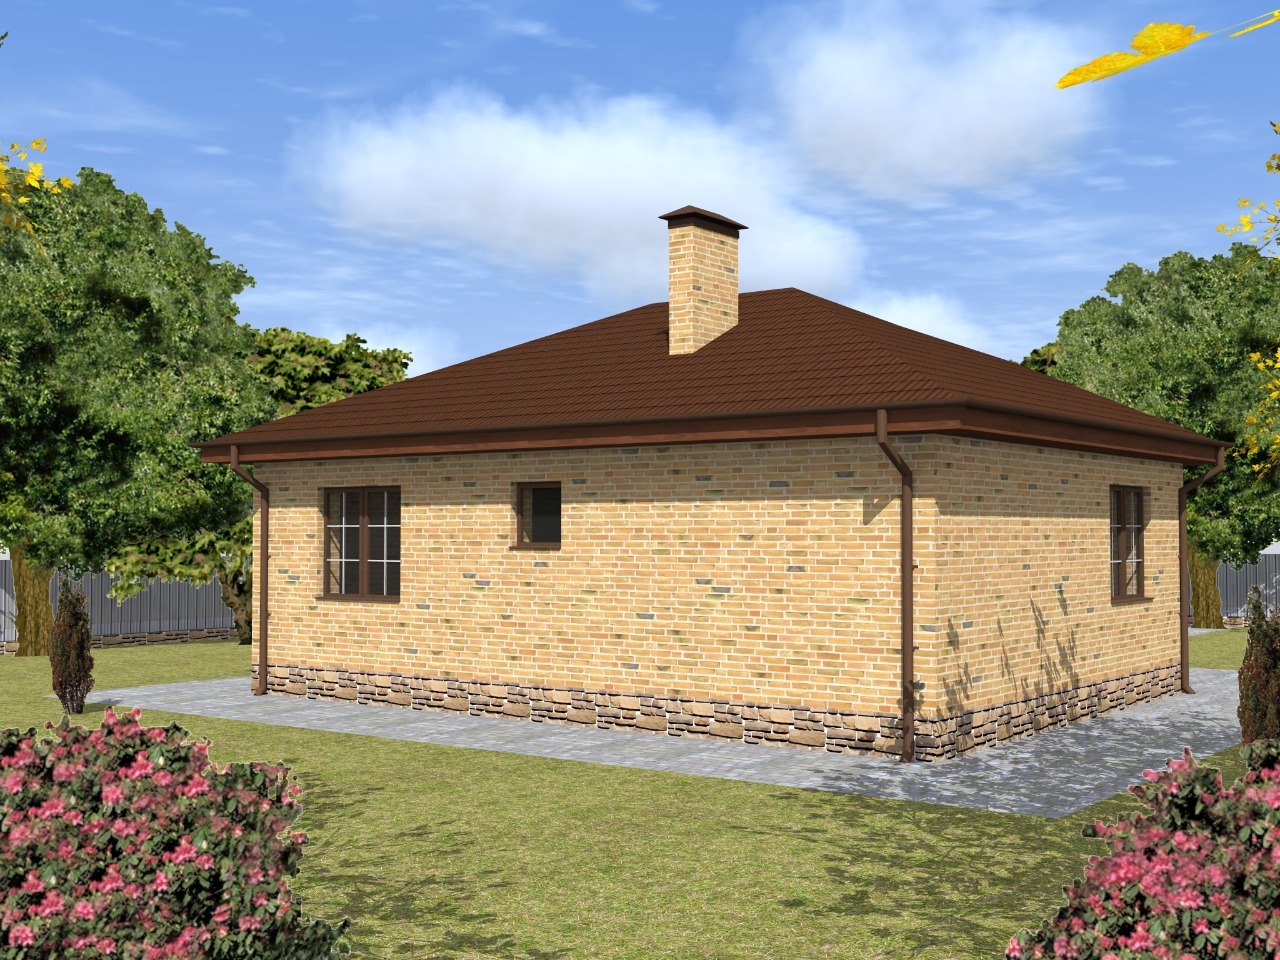 Заказать бетон абакан цена м3 бетона м200 в москве